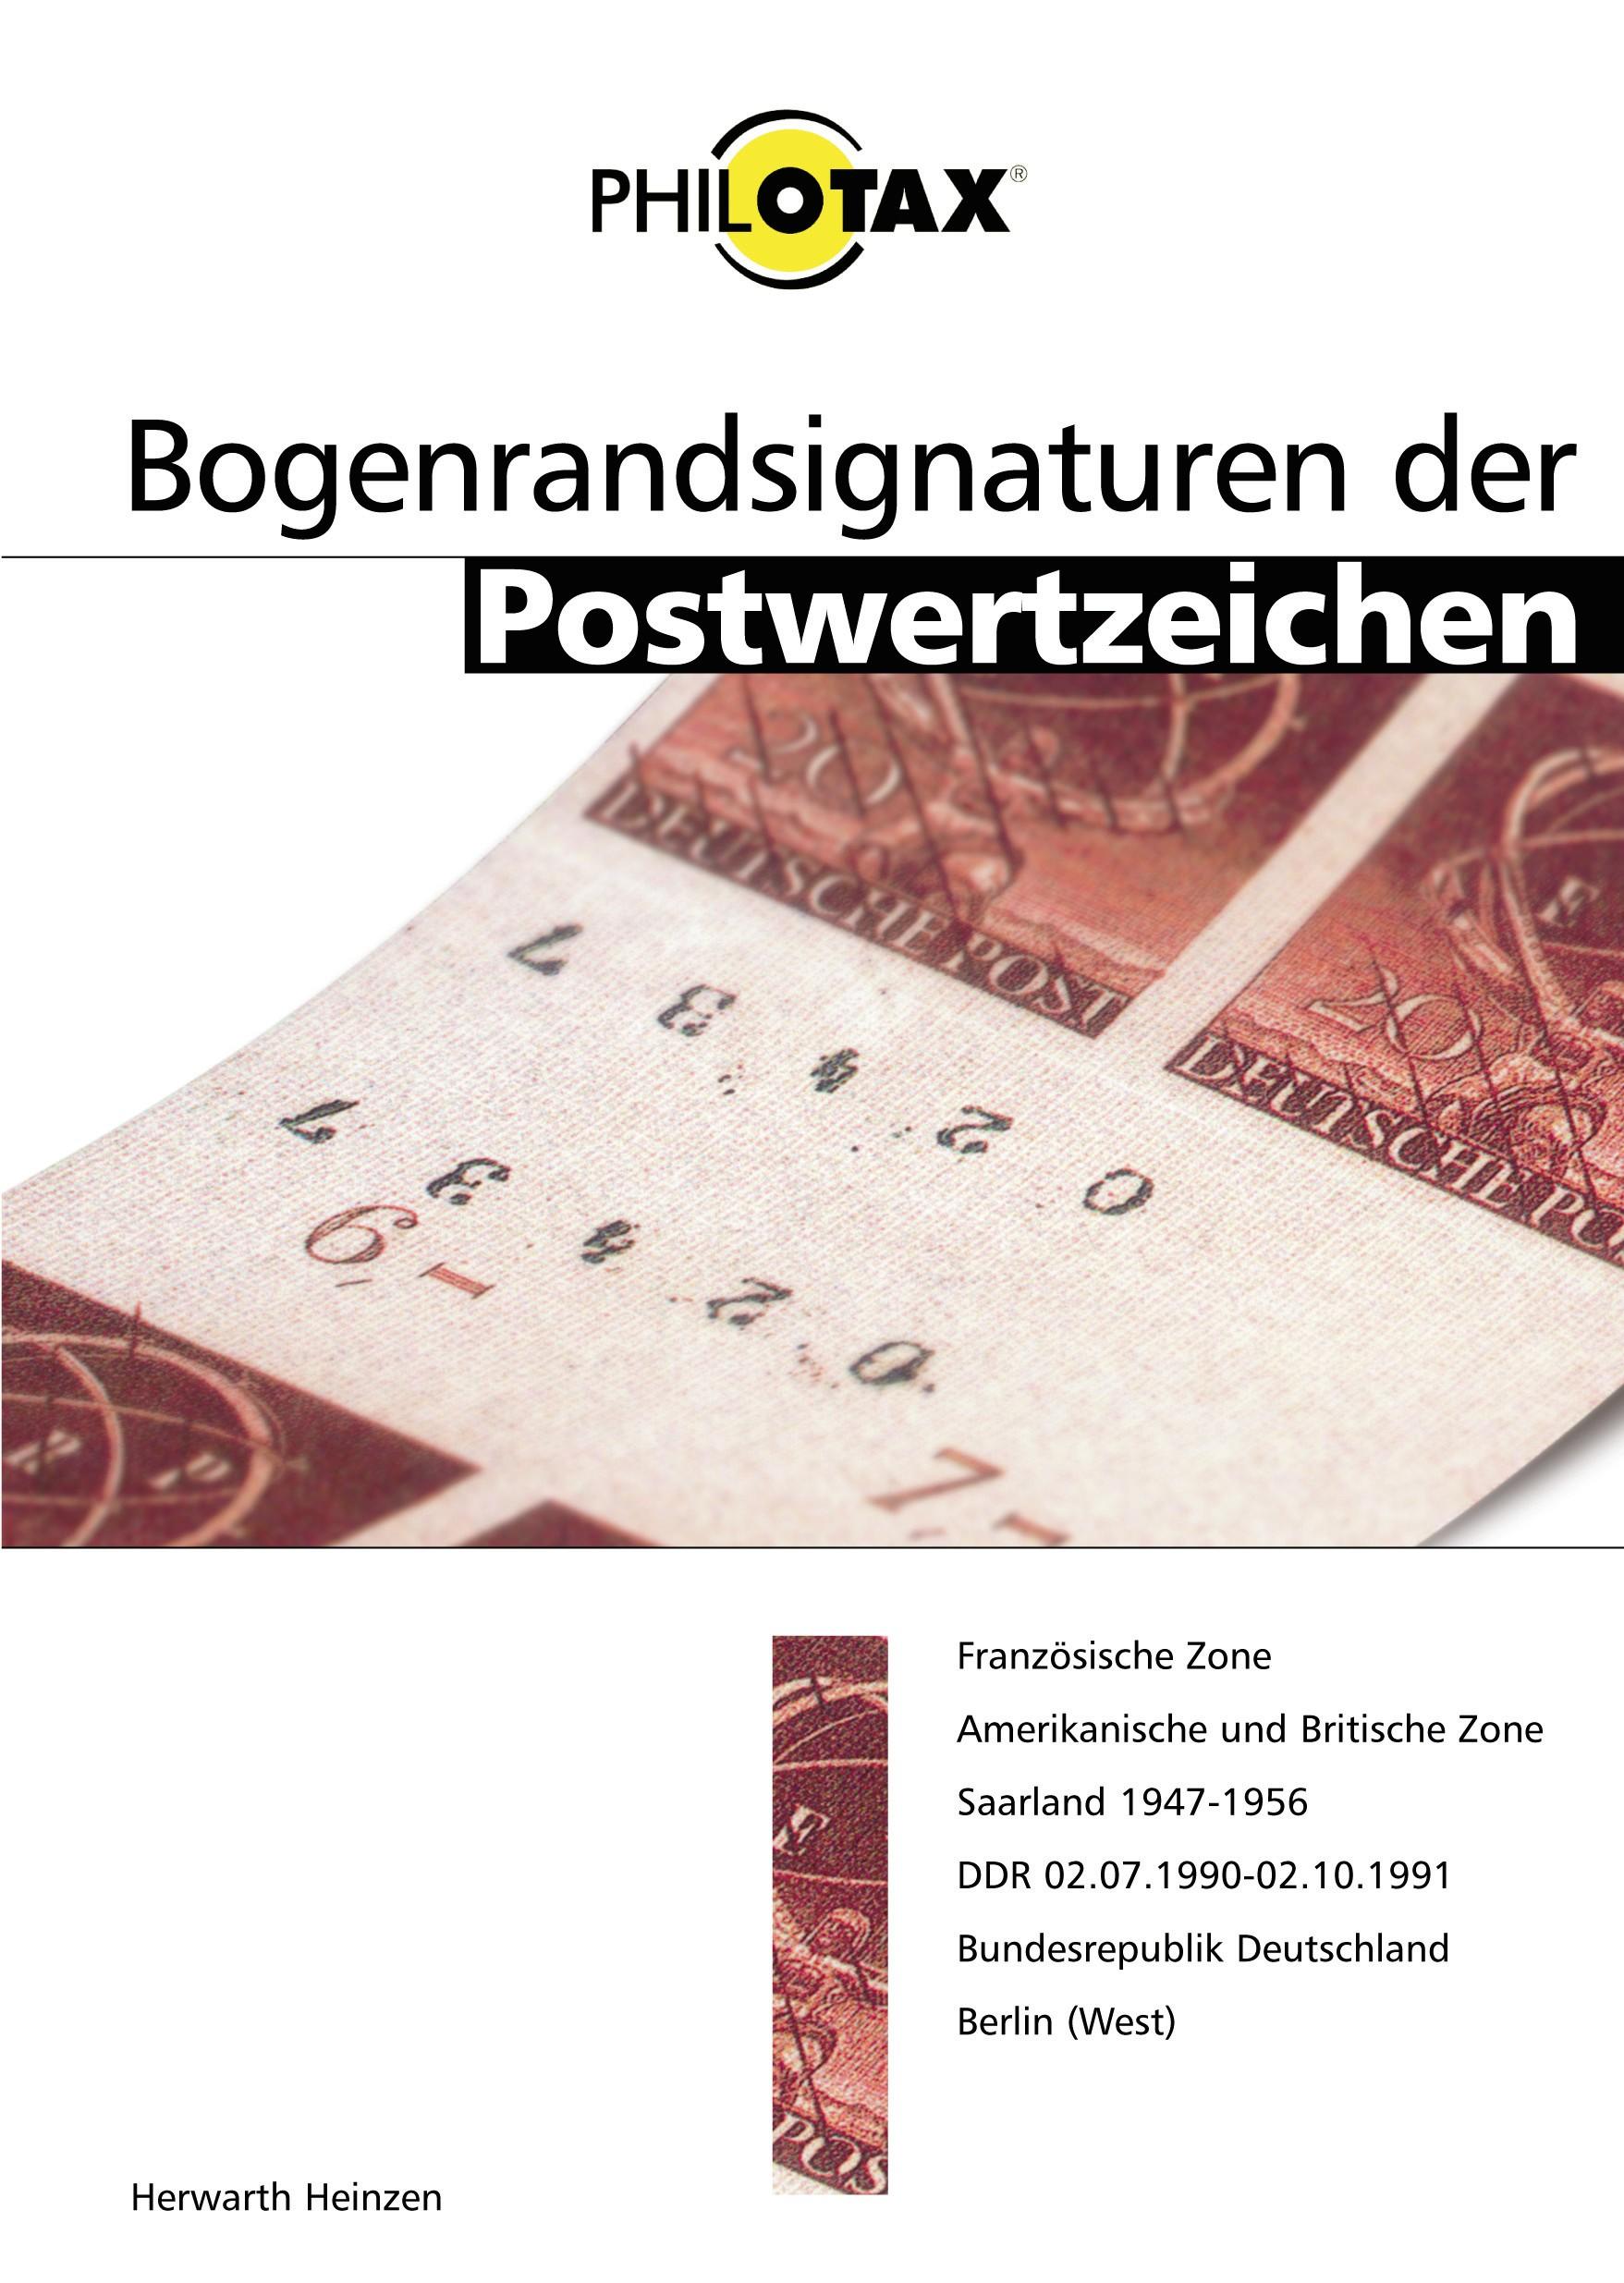 Philotax Katalog Bogenrandsignaturen Deutschland